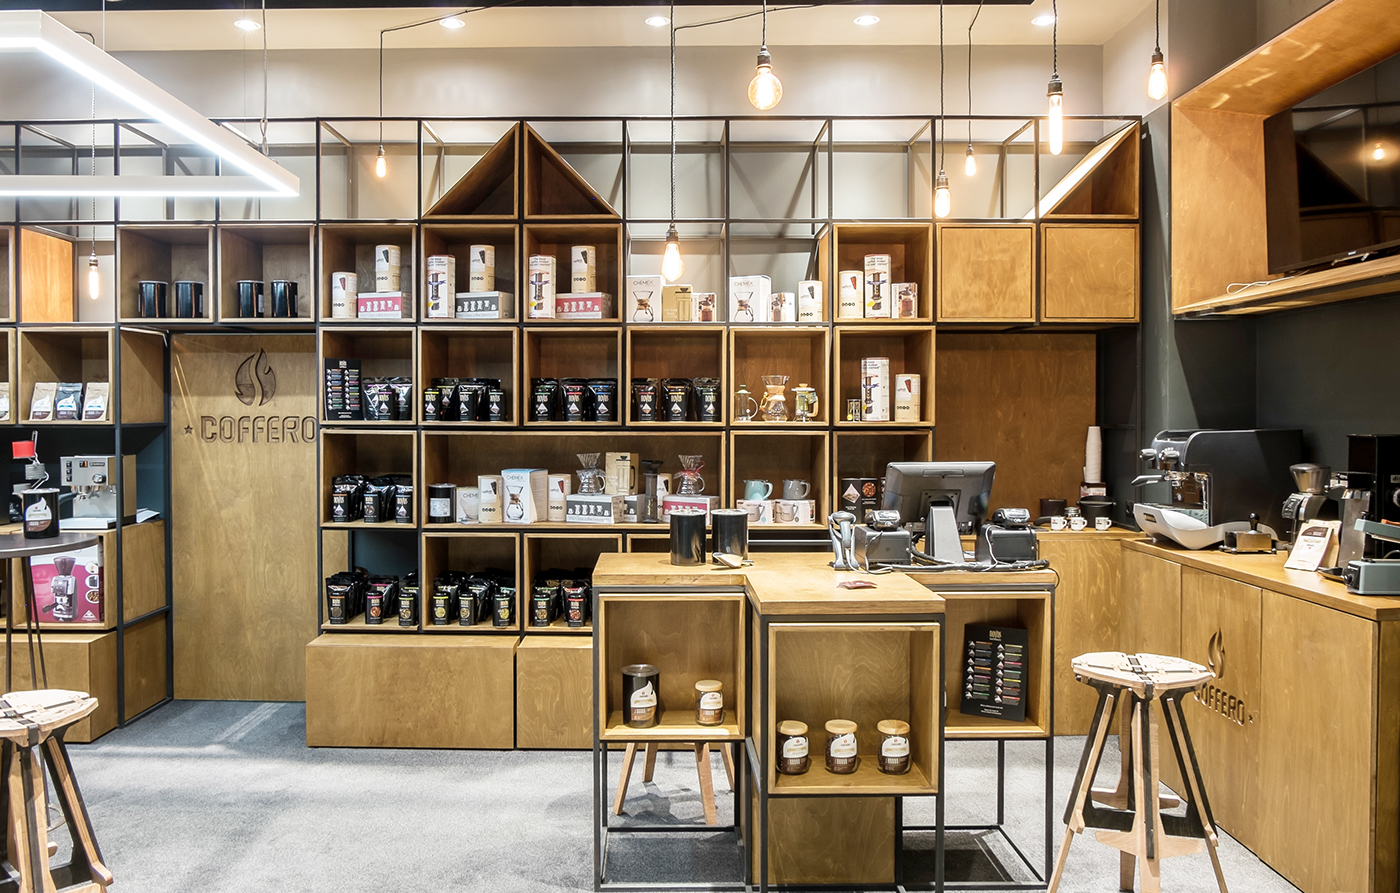 Coffee And Tea Shop 2015 On Behance